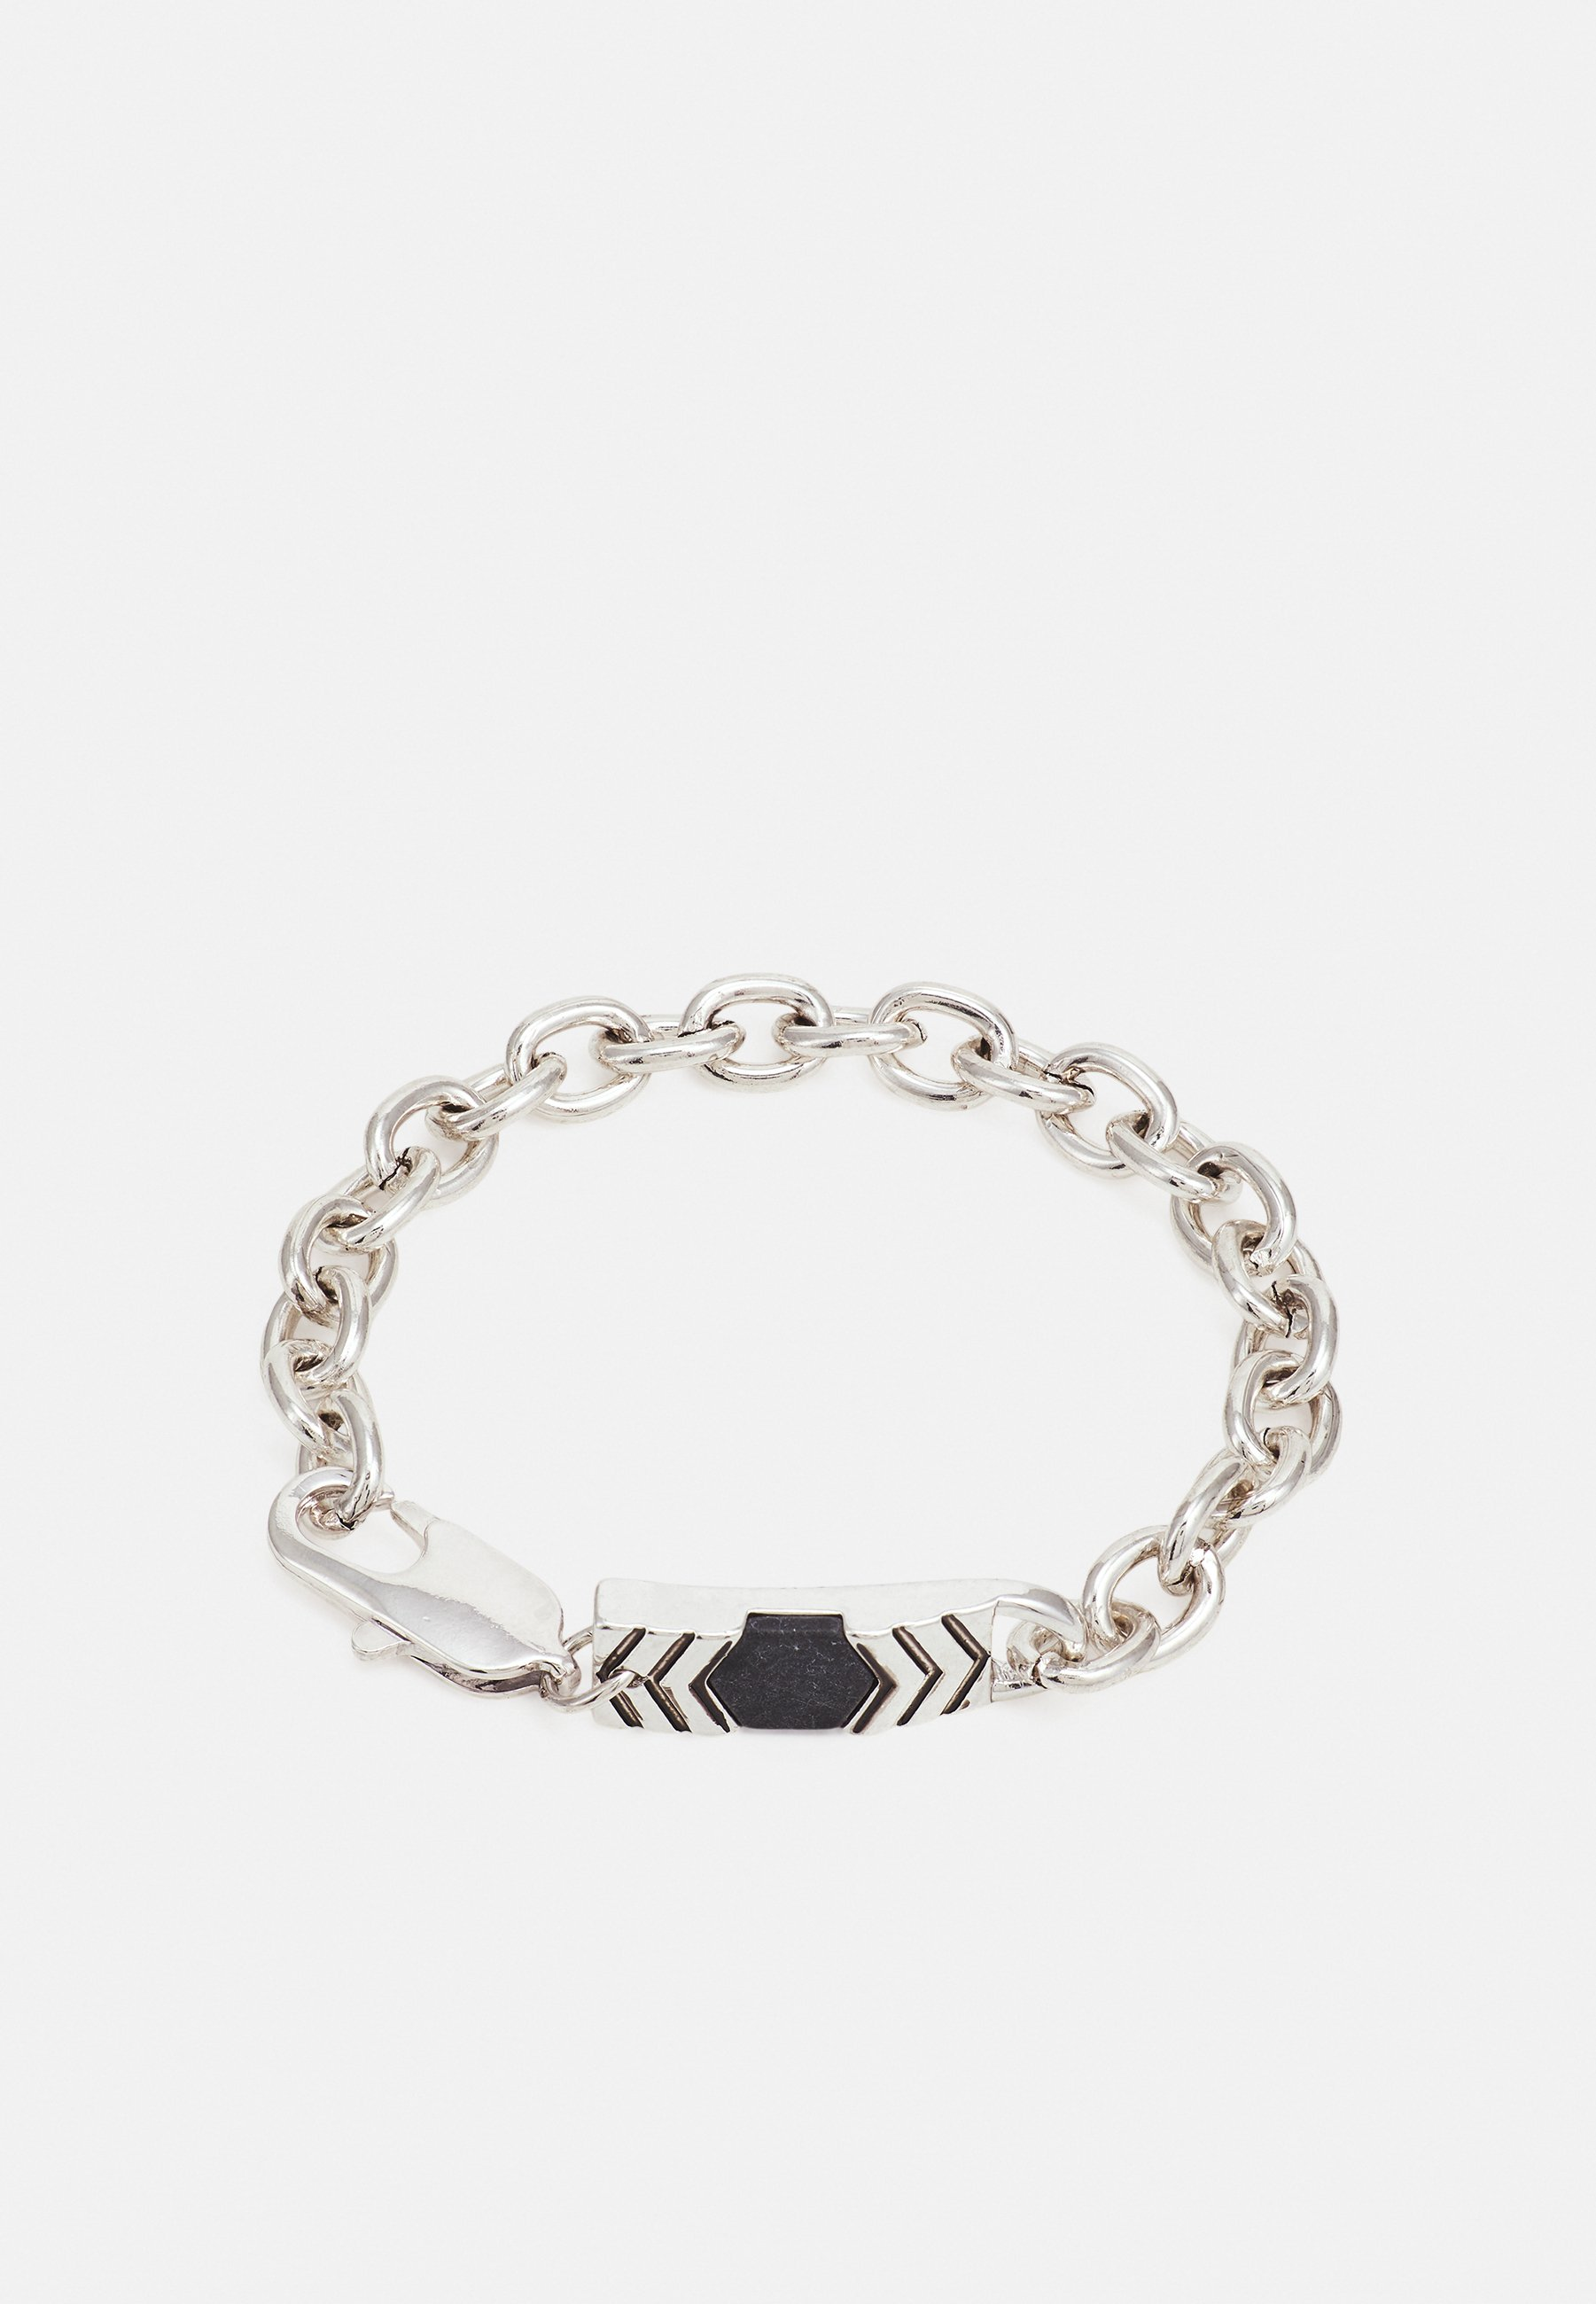 Homme COLLECTIVE CONSCIENCE BRACELET - Bracelet